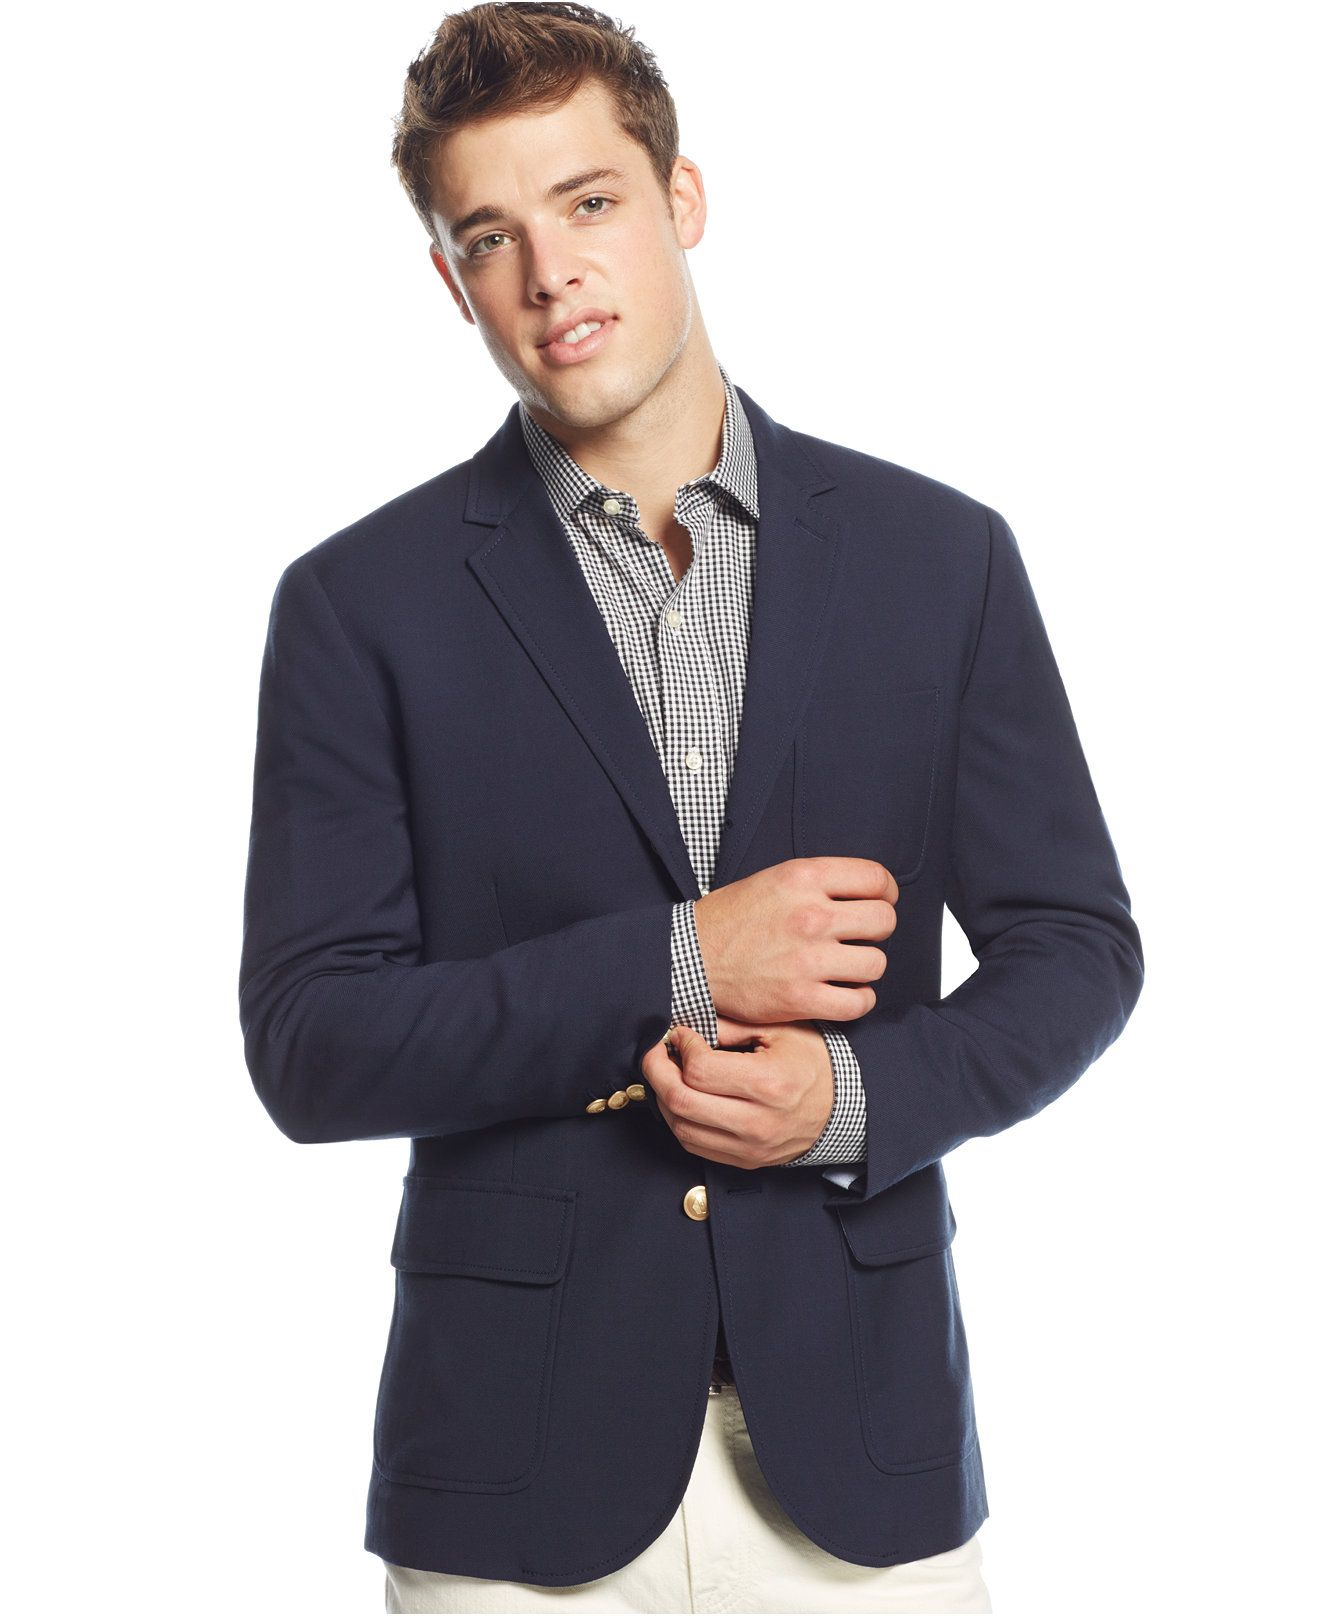 a90e3c164d Tommy Hilfiger Cerruti Navy Two-Button Blazer - Blazers   Sport Coats - Men  - Macy s